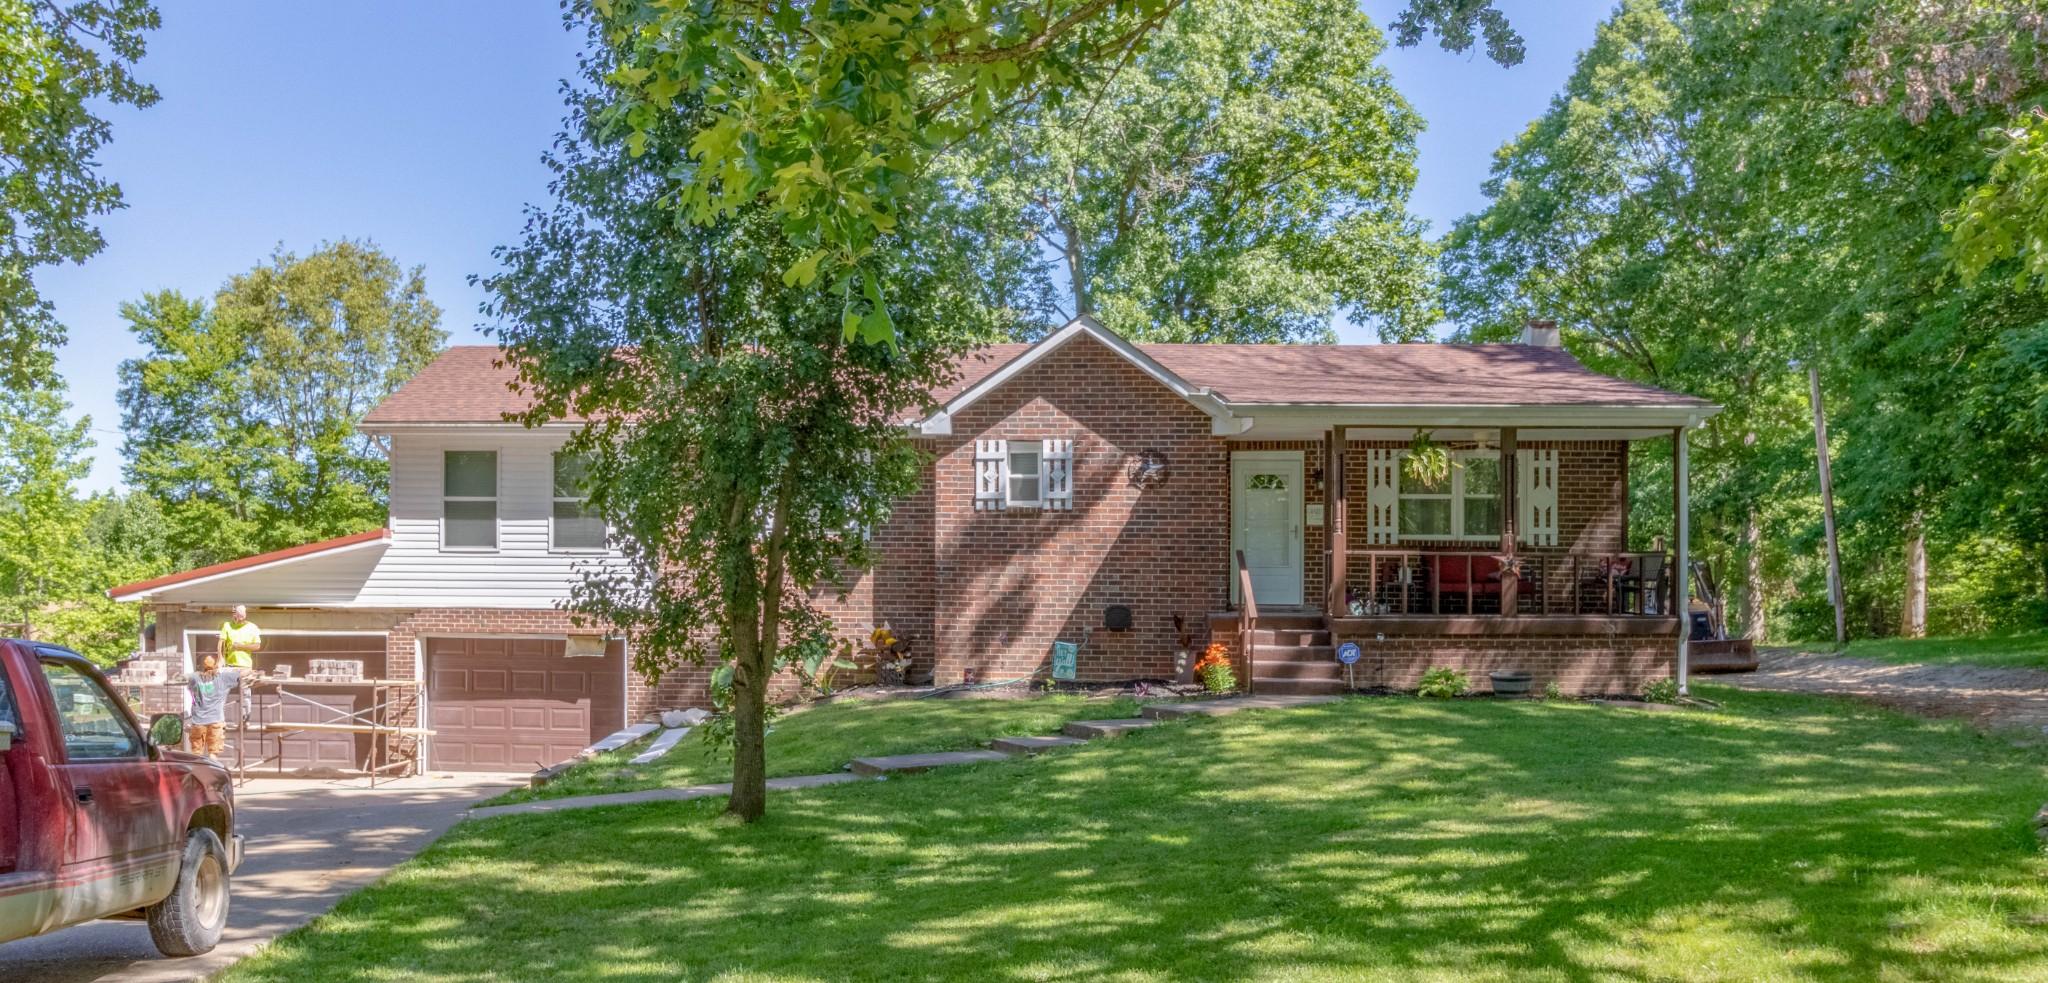 4389 Saint Paul Rd, Woodlawn, TN 37191 - Woodlawn, TN real estate listing